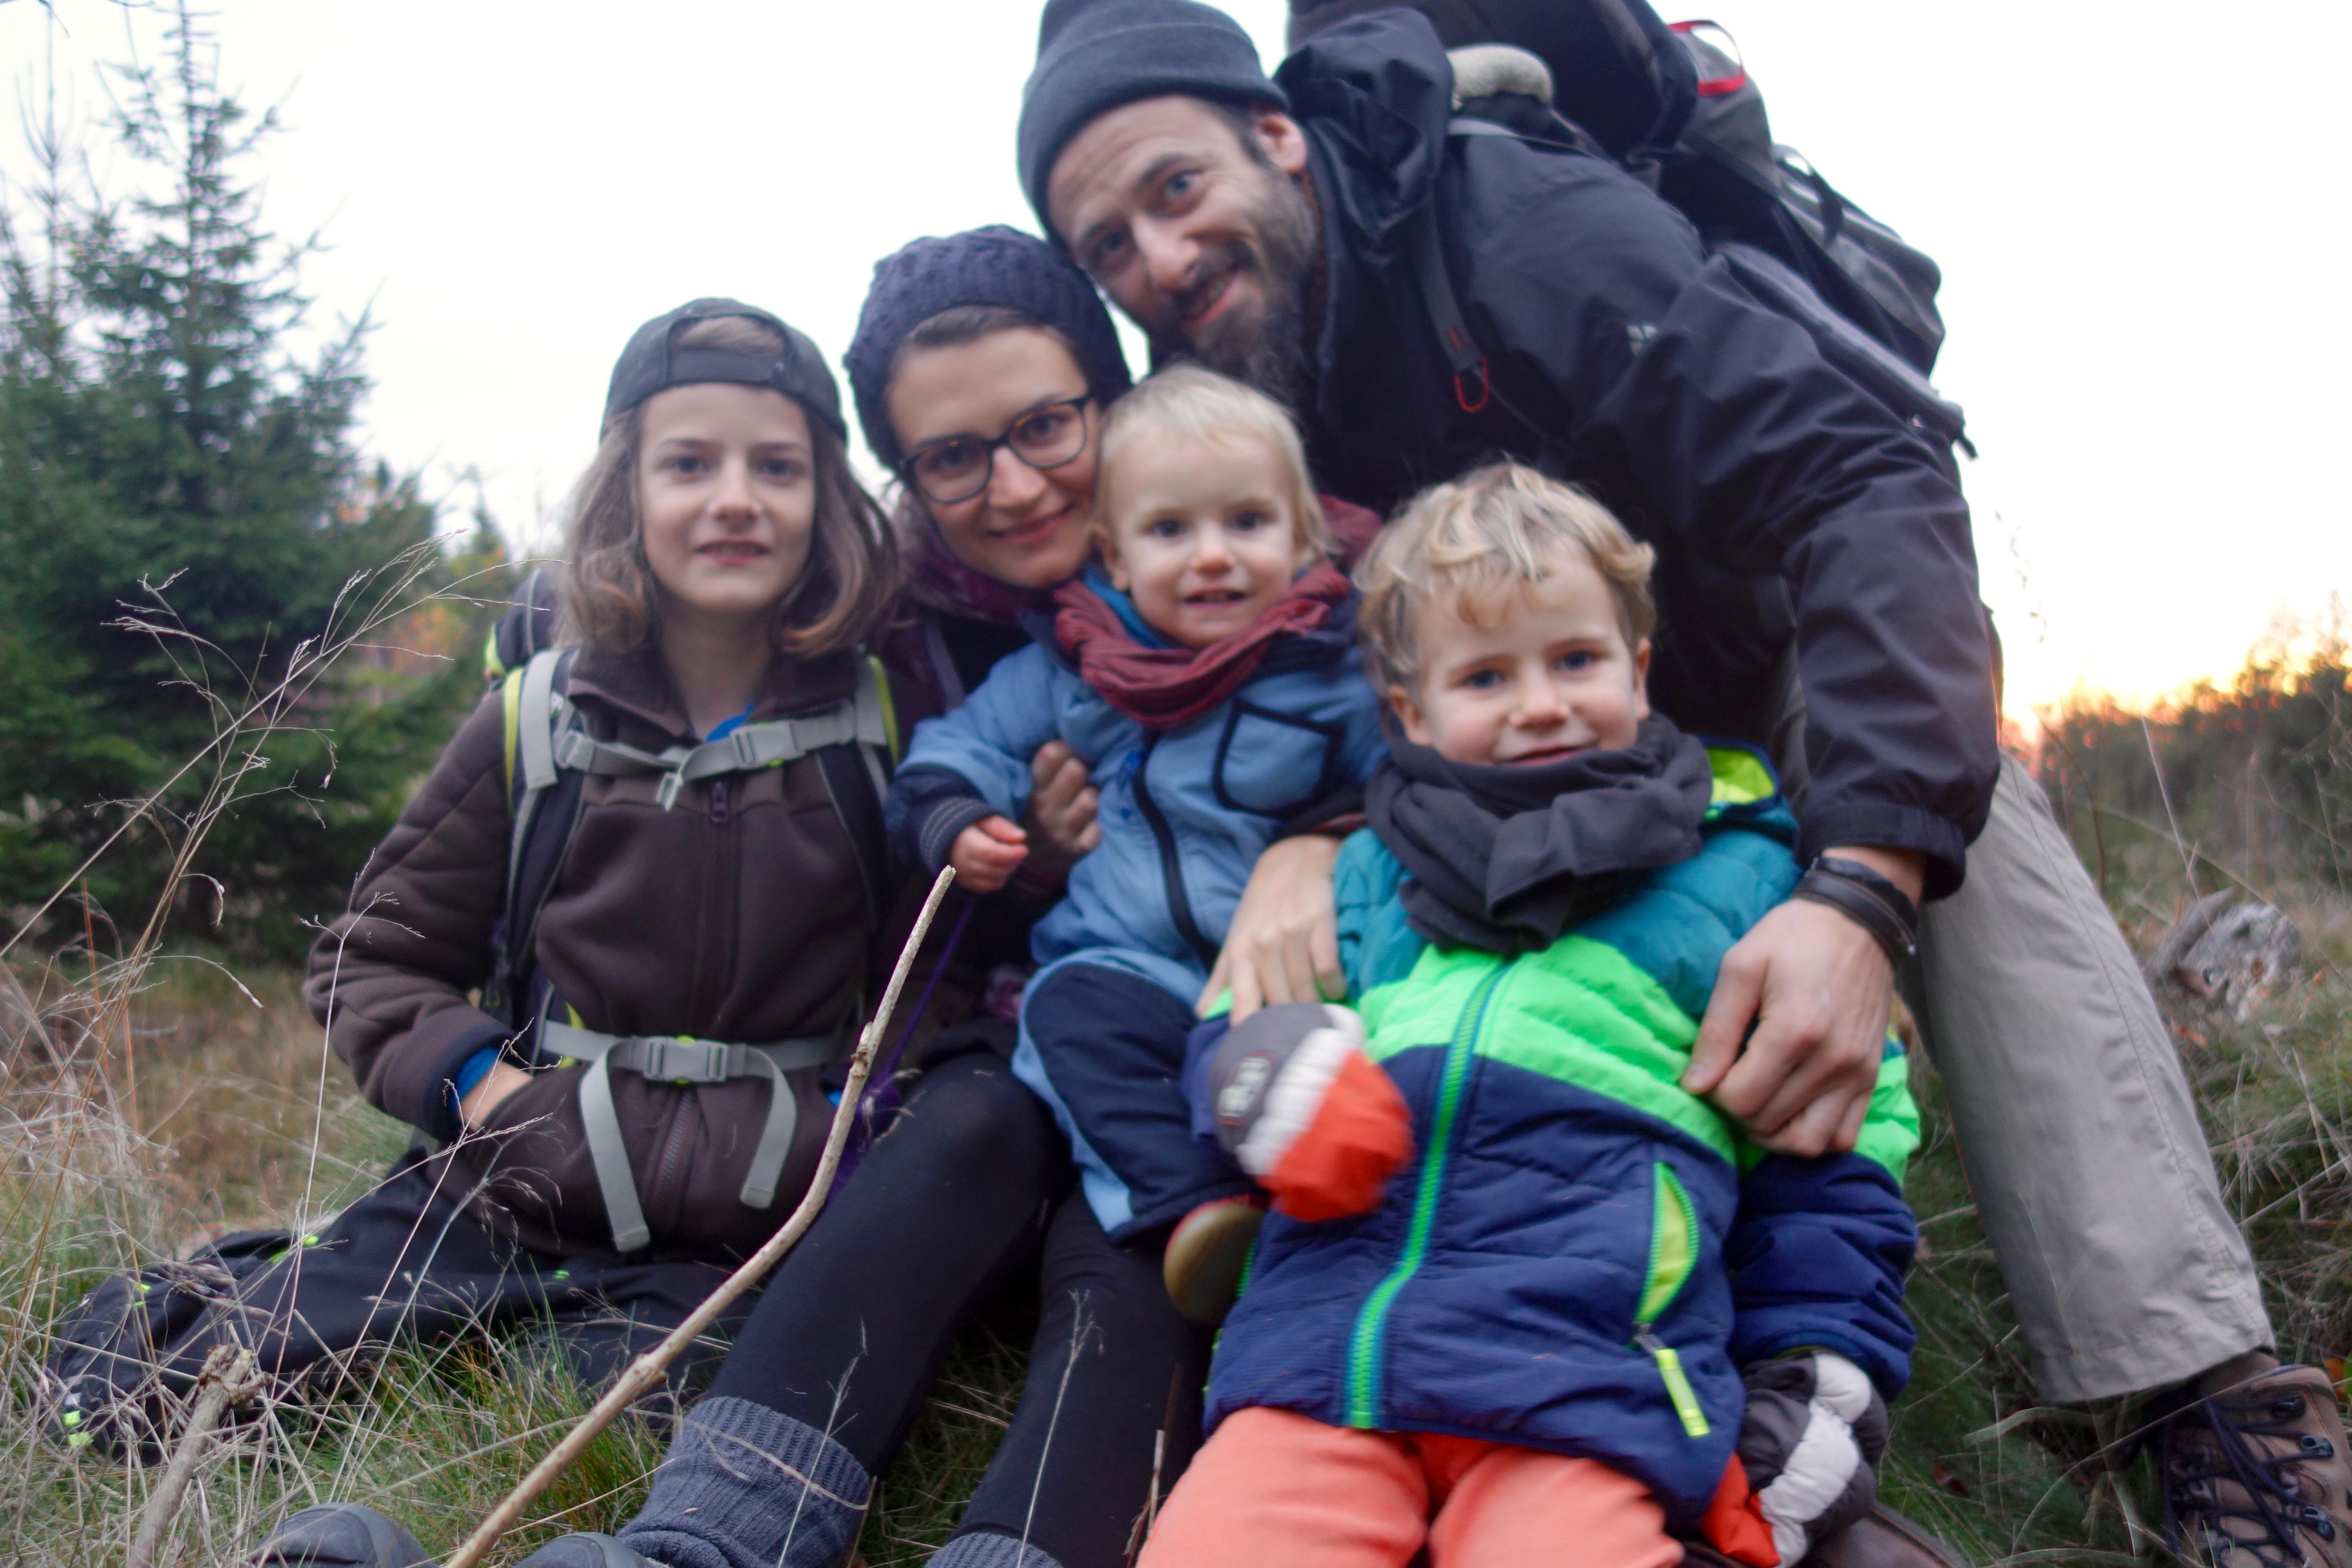 Martin, Julia, Oskar, Viktor und Arthur im Freien_01